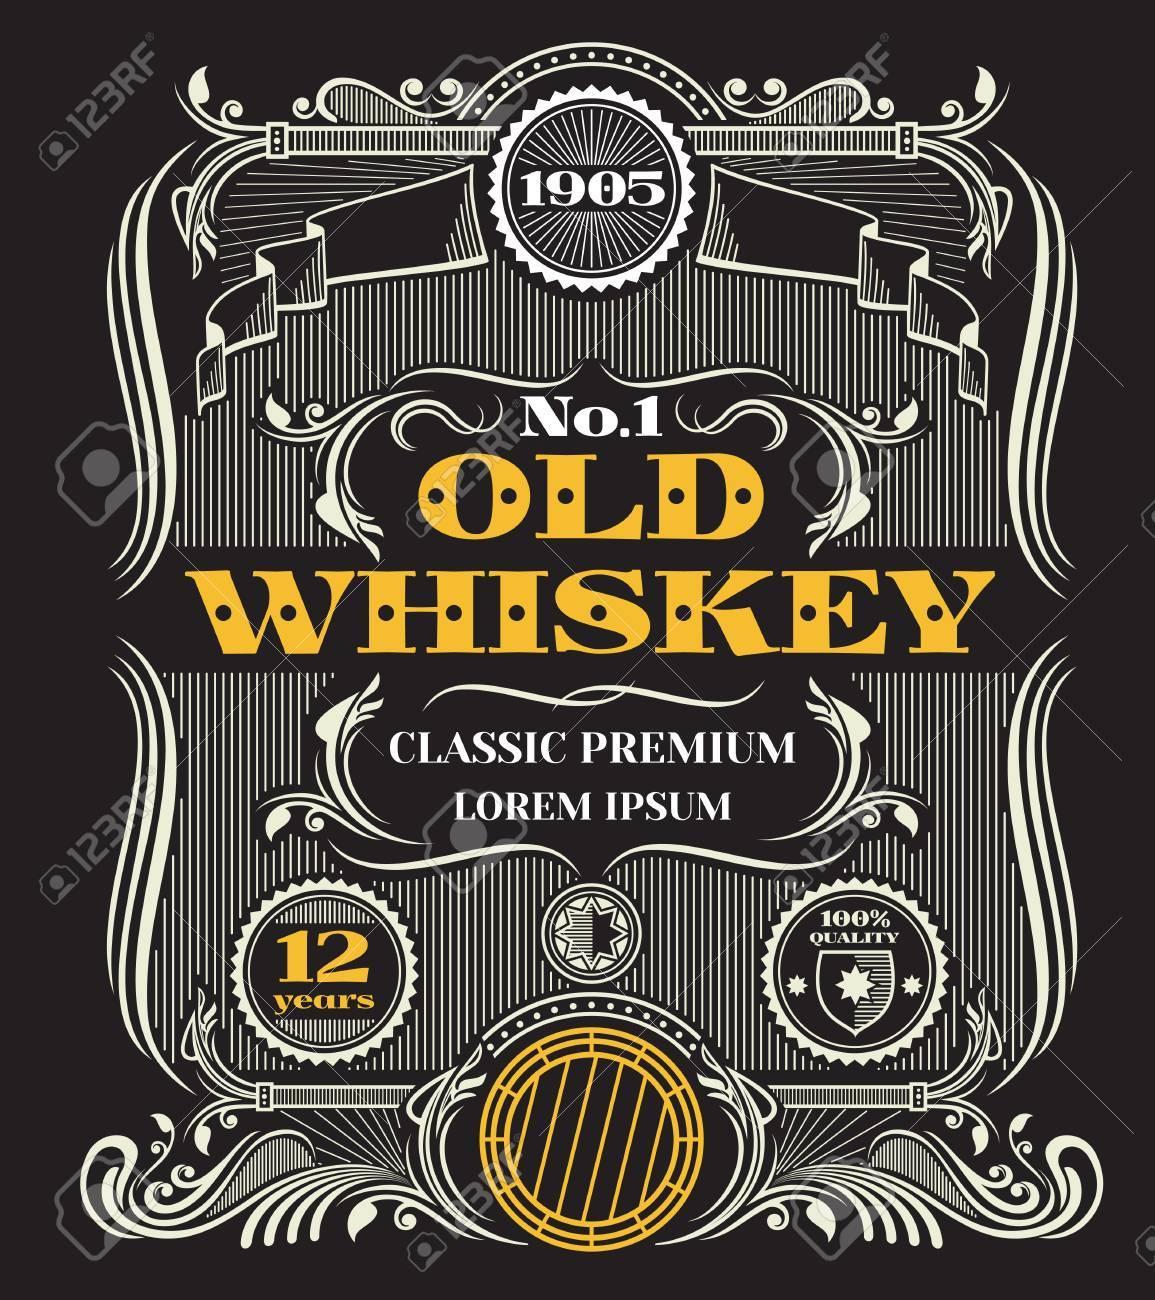 Retro Victorian Whiskey Vector Label Template Emblem For Bottle Of Alcohol Beverage Illustration Stock